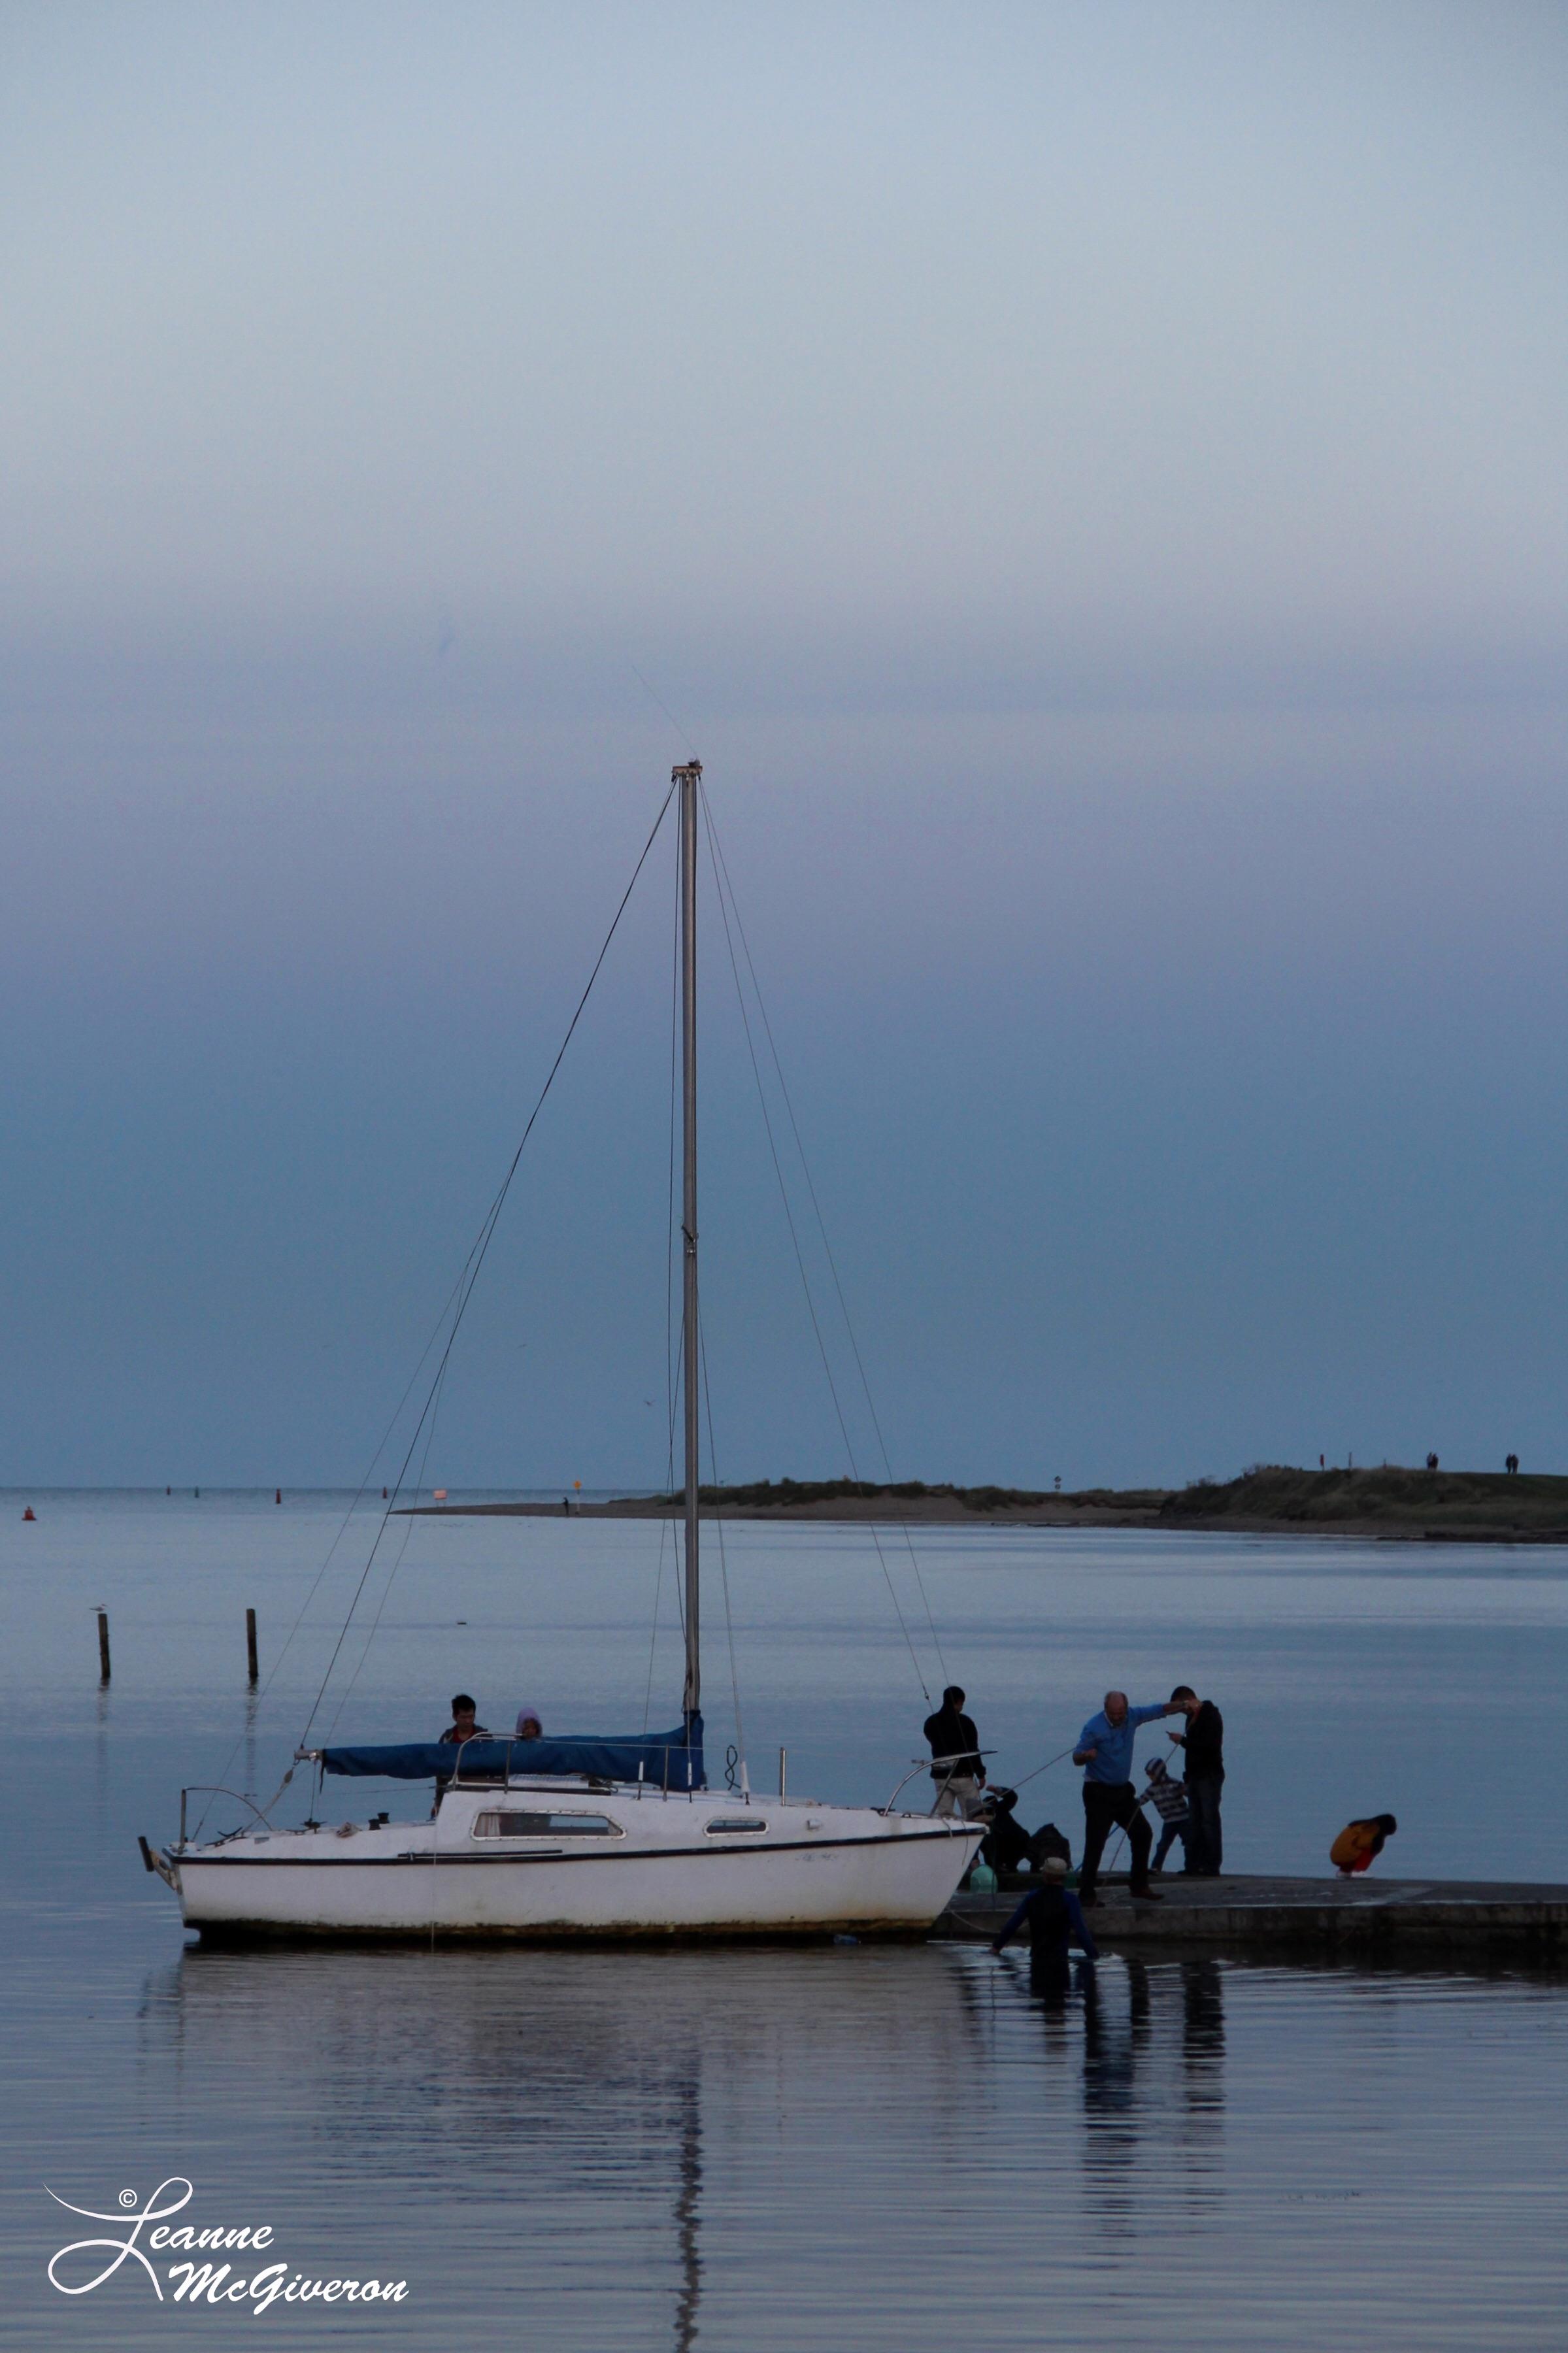 After an Evening Sail, Malahide Harbour, County Dublin